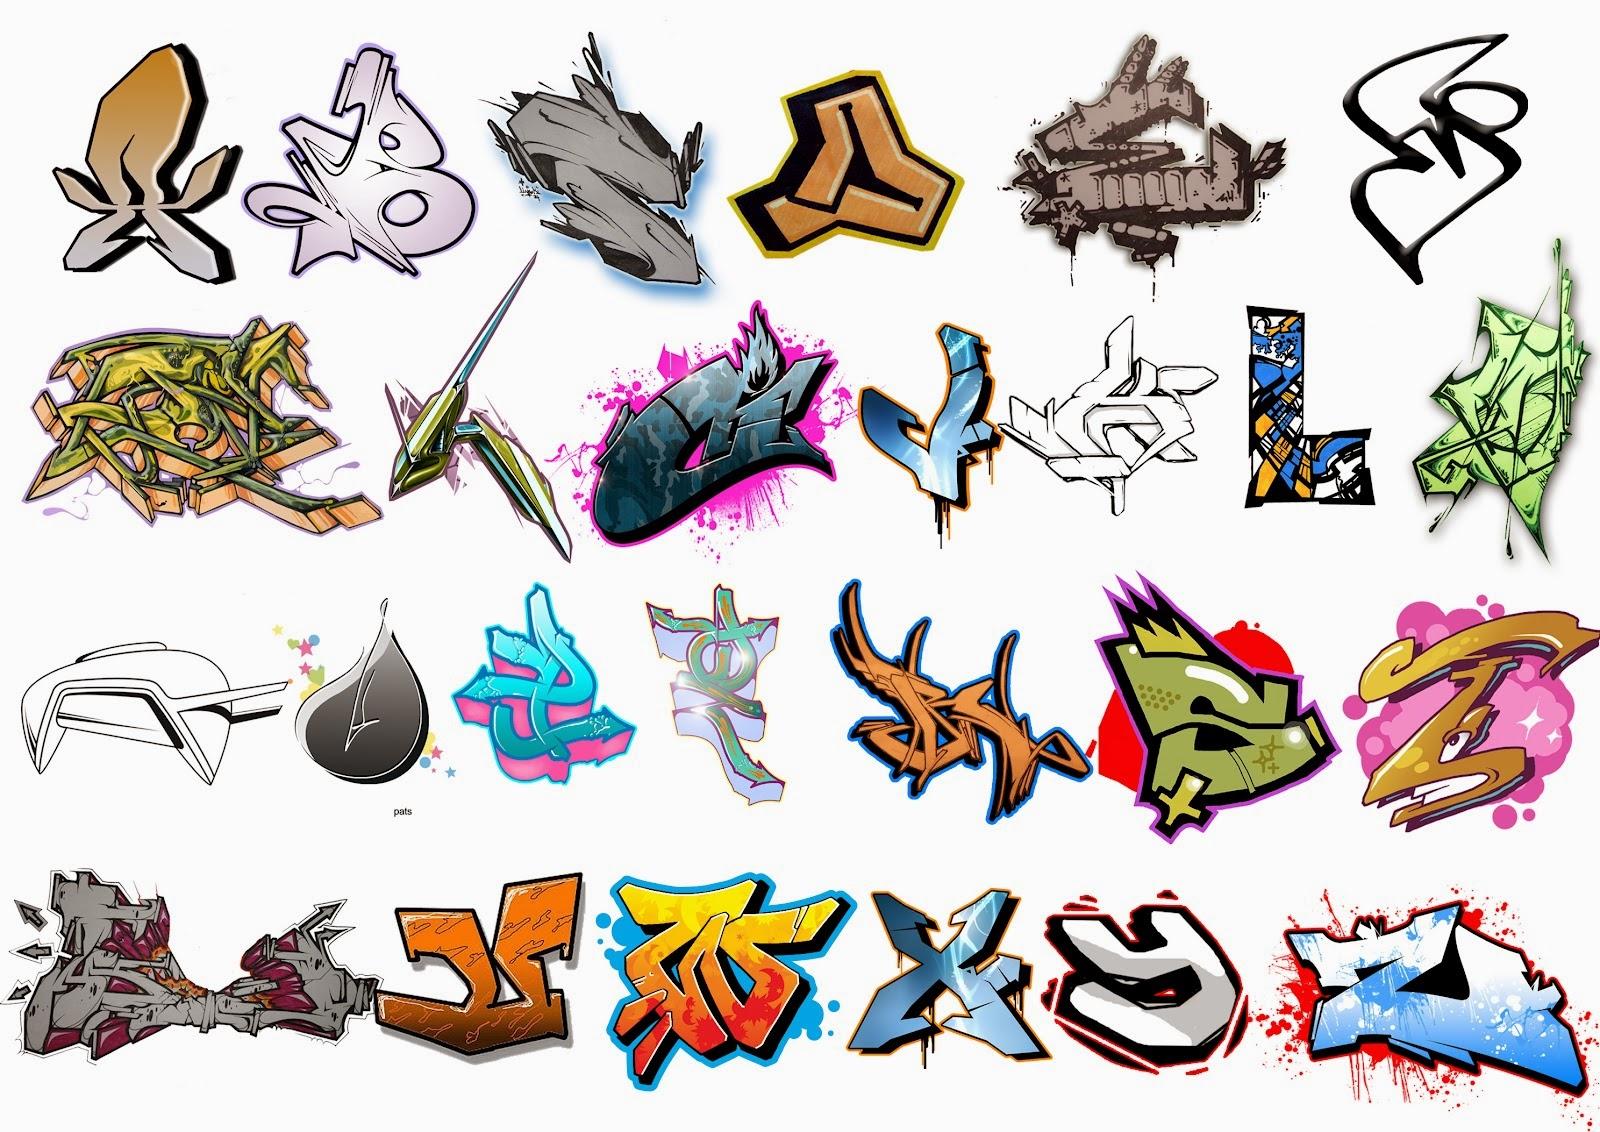 Graffiti Wall: Graffiti Alphabet